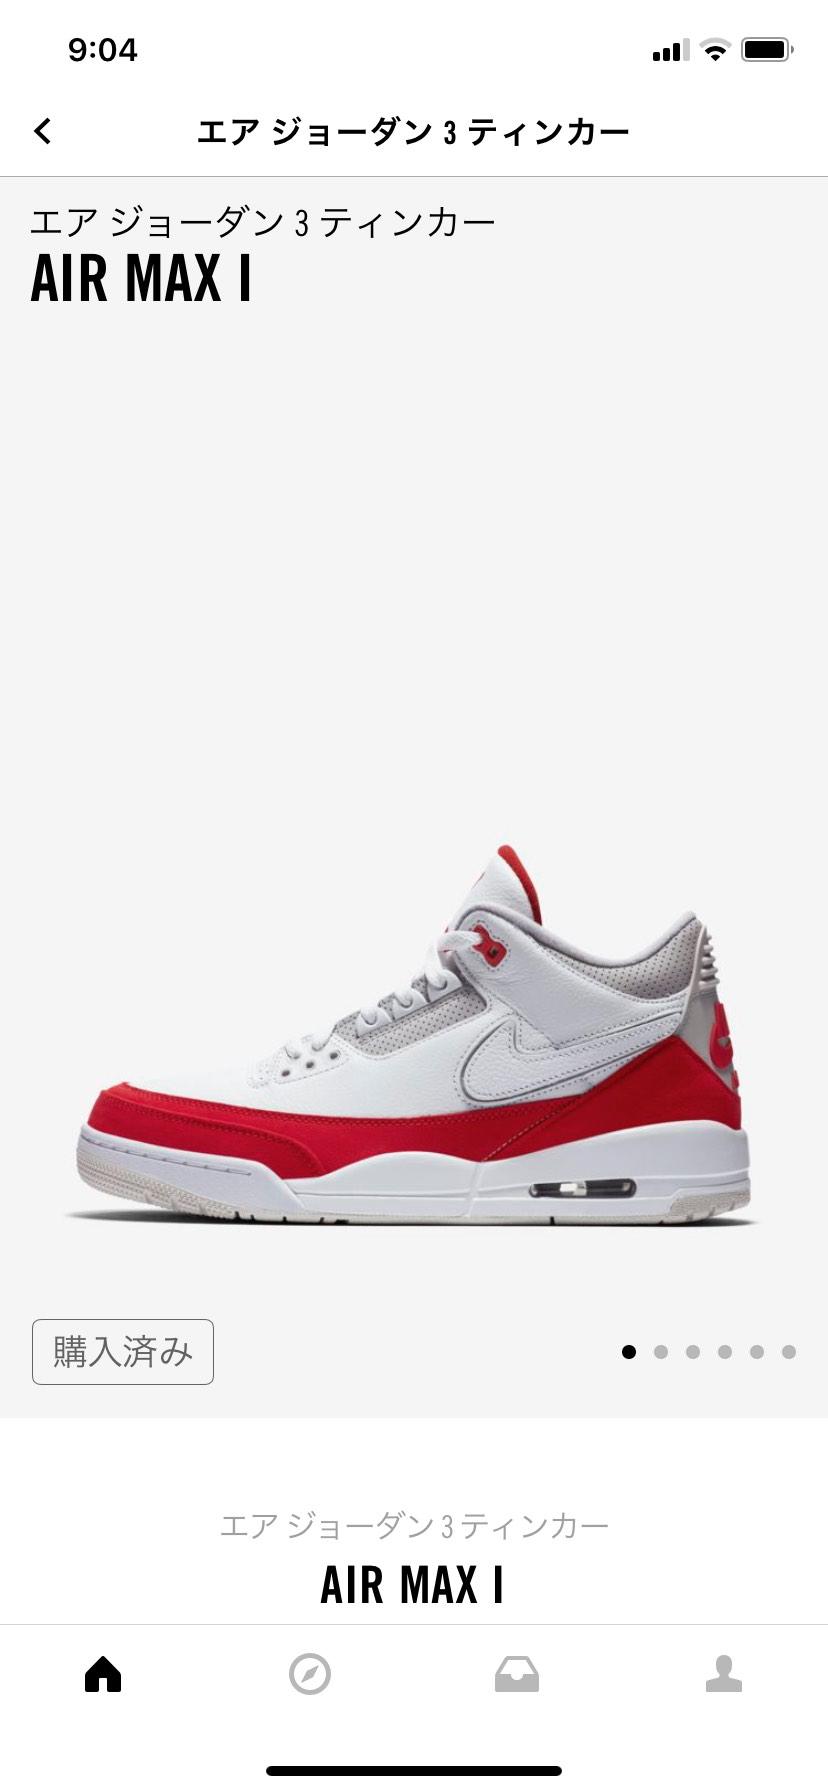 ( `・ω・) ウーム…最近靴買いすぎだ。 欲しい方居ますか? 流石に定価っ